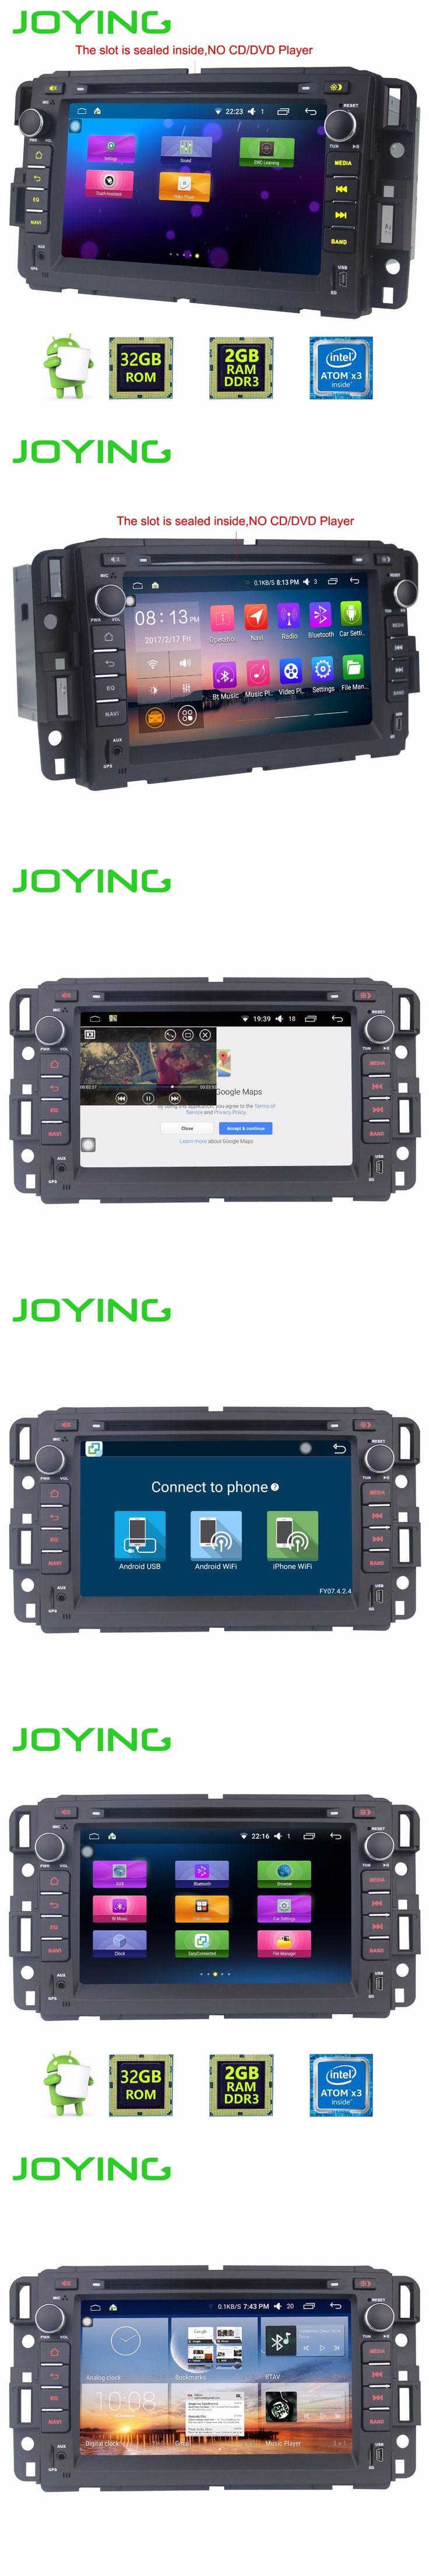 "Joying 2GB+32GB Android 5.1 Quad Core 7"" Car Stereo Radio GPS Navigation For Chevrolet Traverse Tahoe Suburban GMC Buick Enclave"